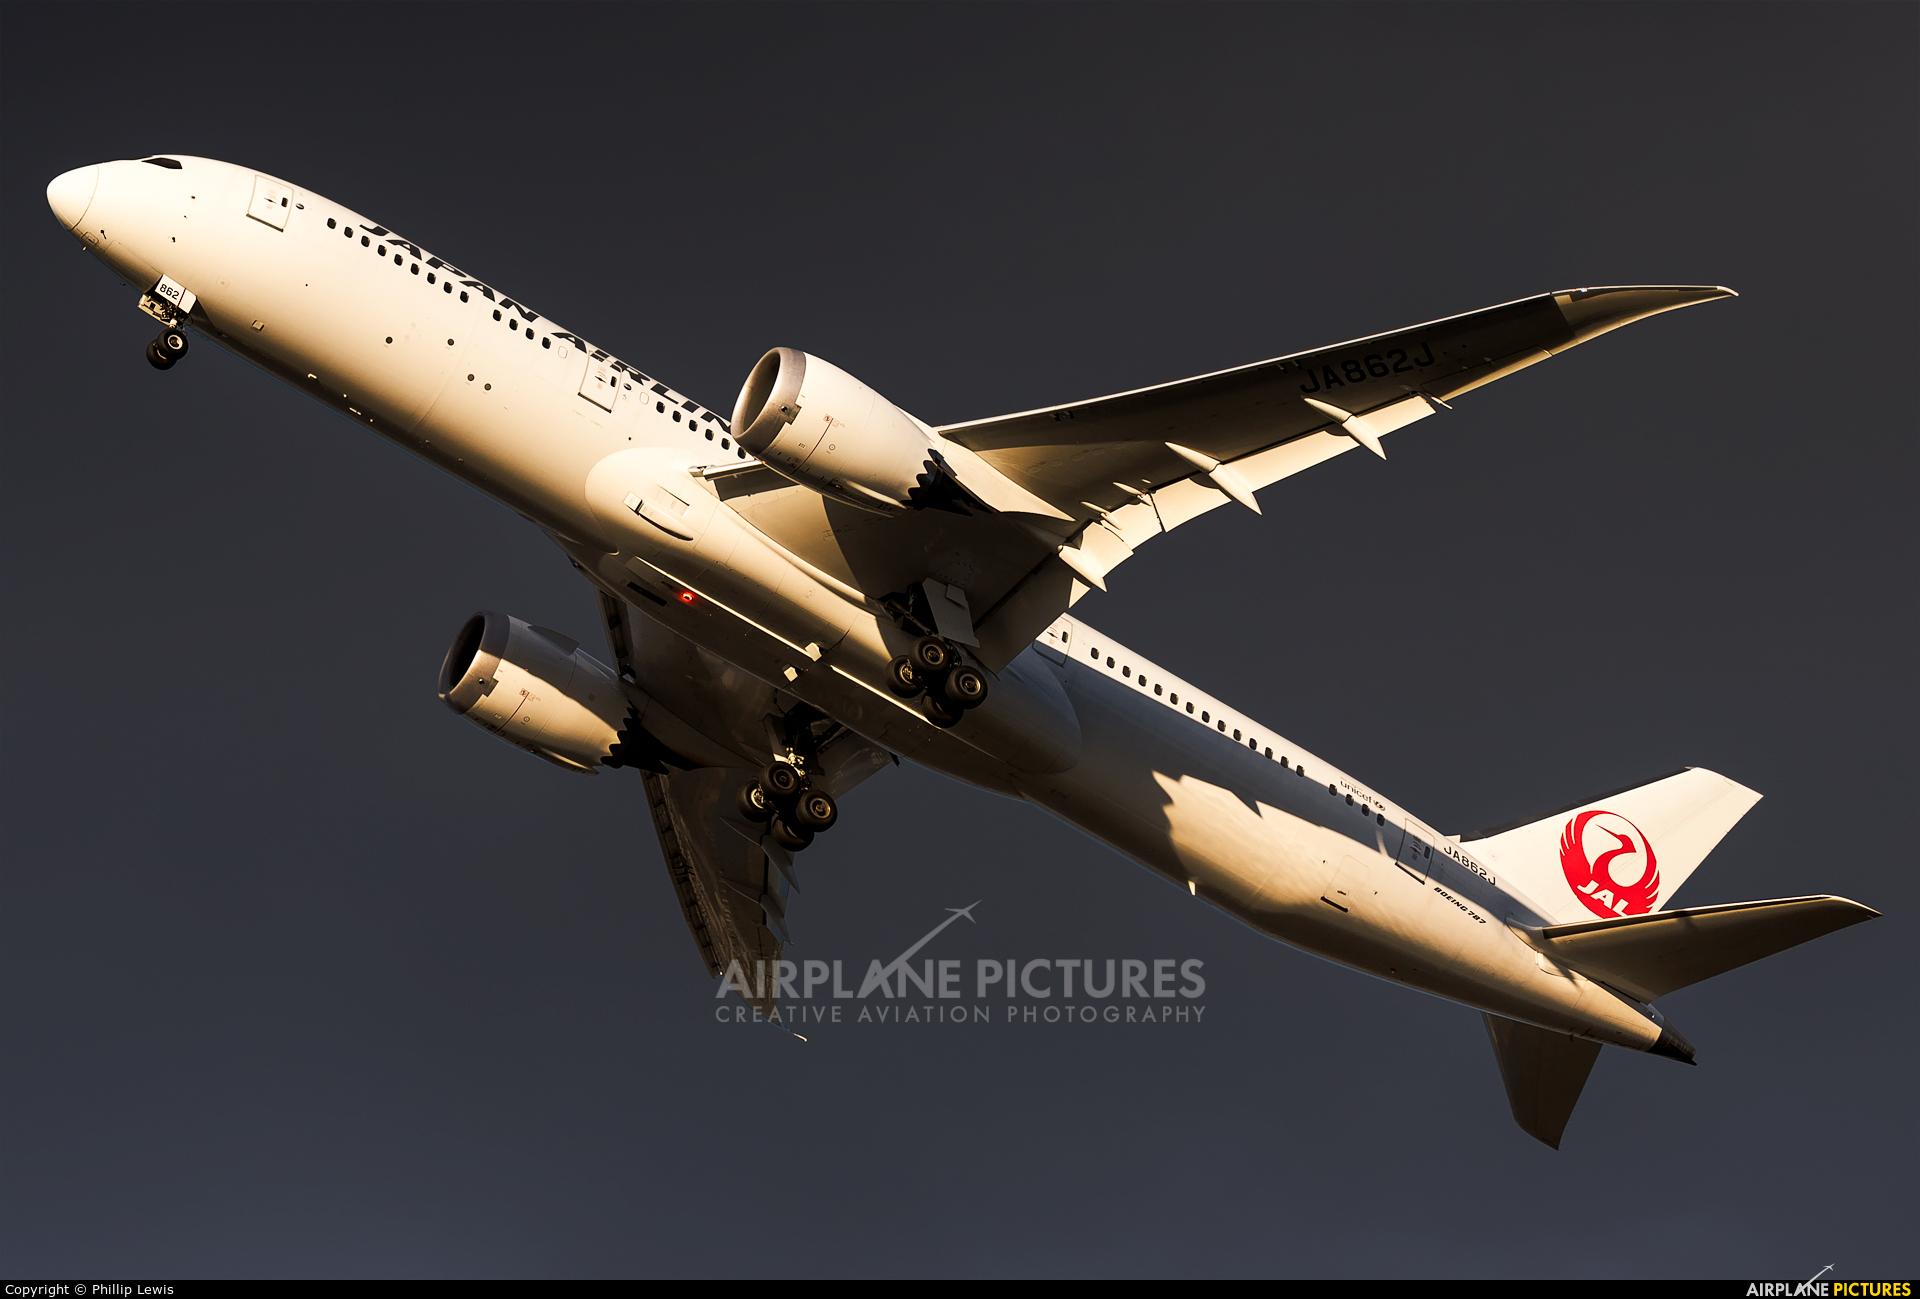 JAL - Japan Airlines JA862J aircraft at Frankfurt